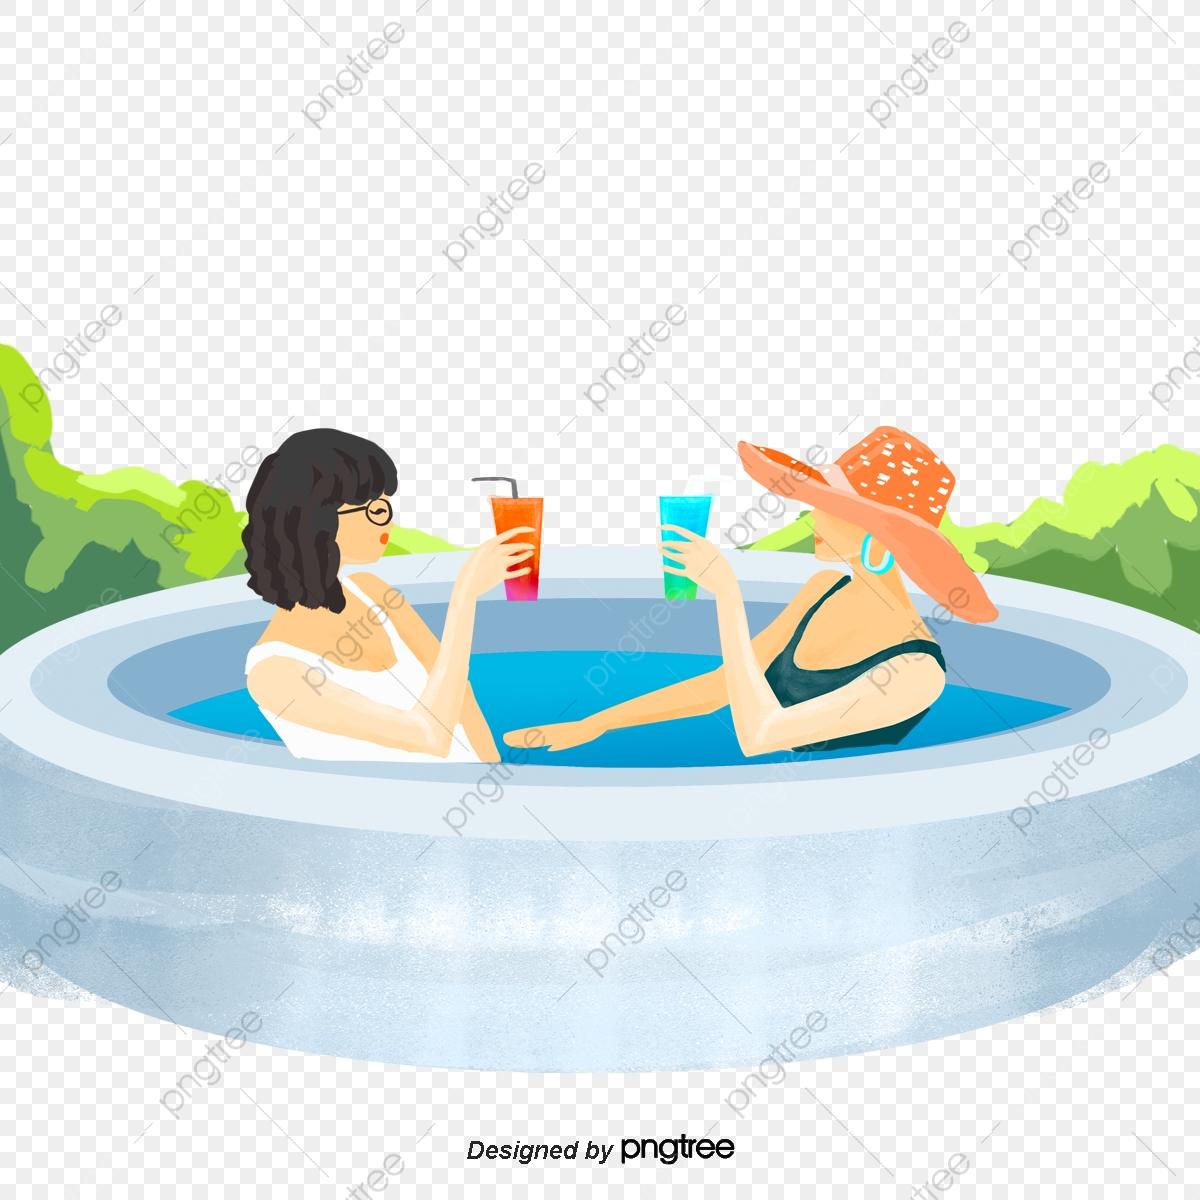 Drinks clipart pool. Cartoon female swimming straw